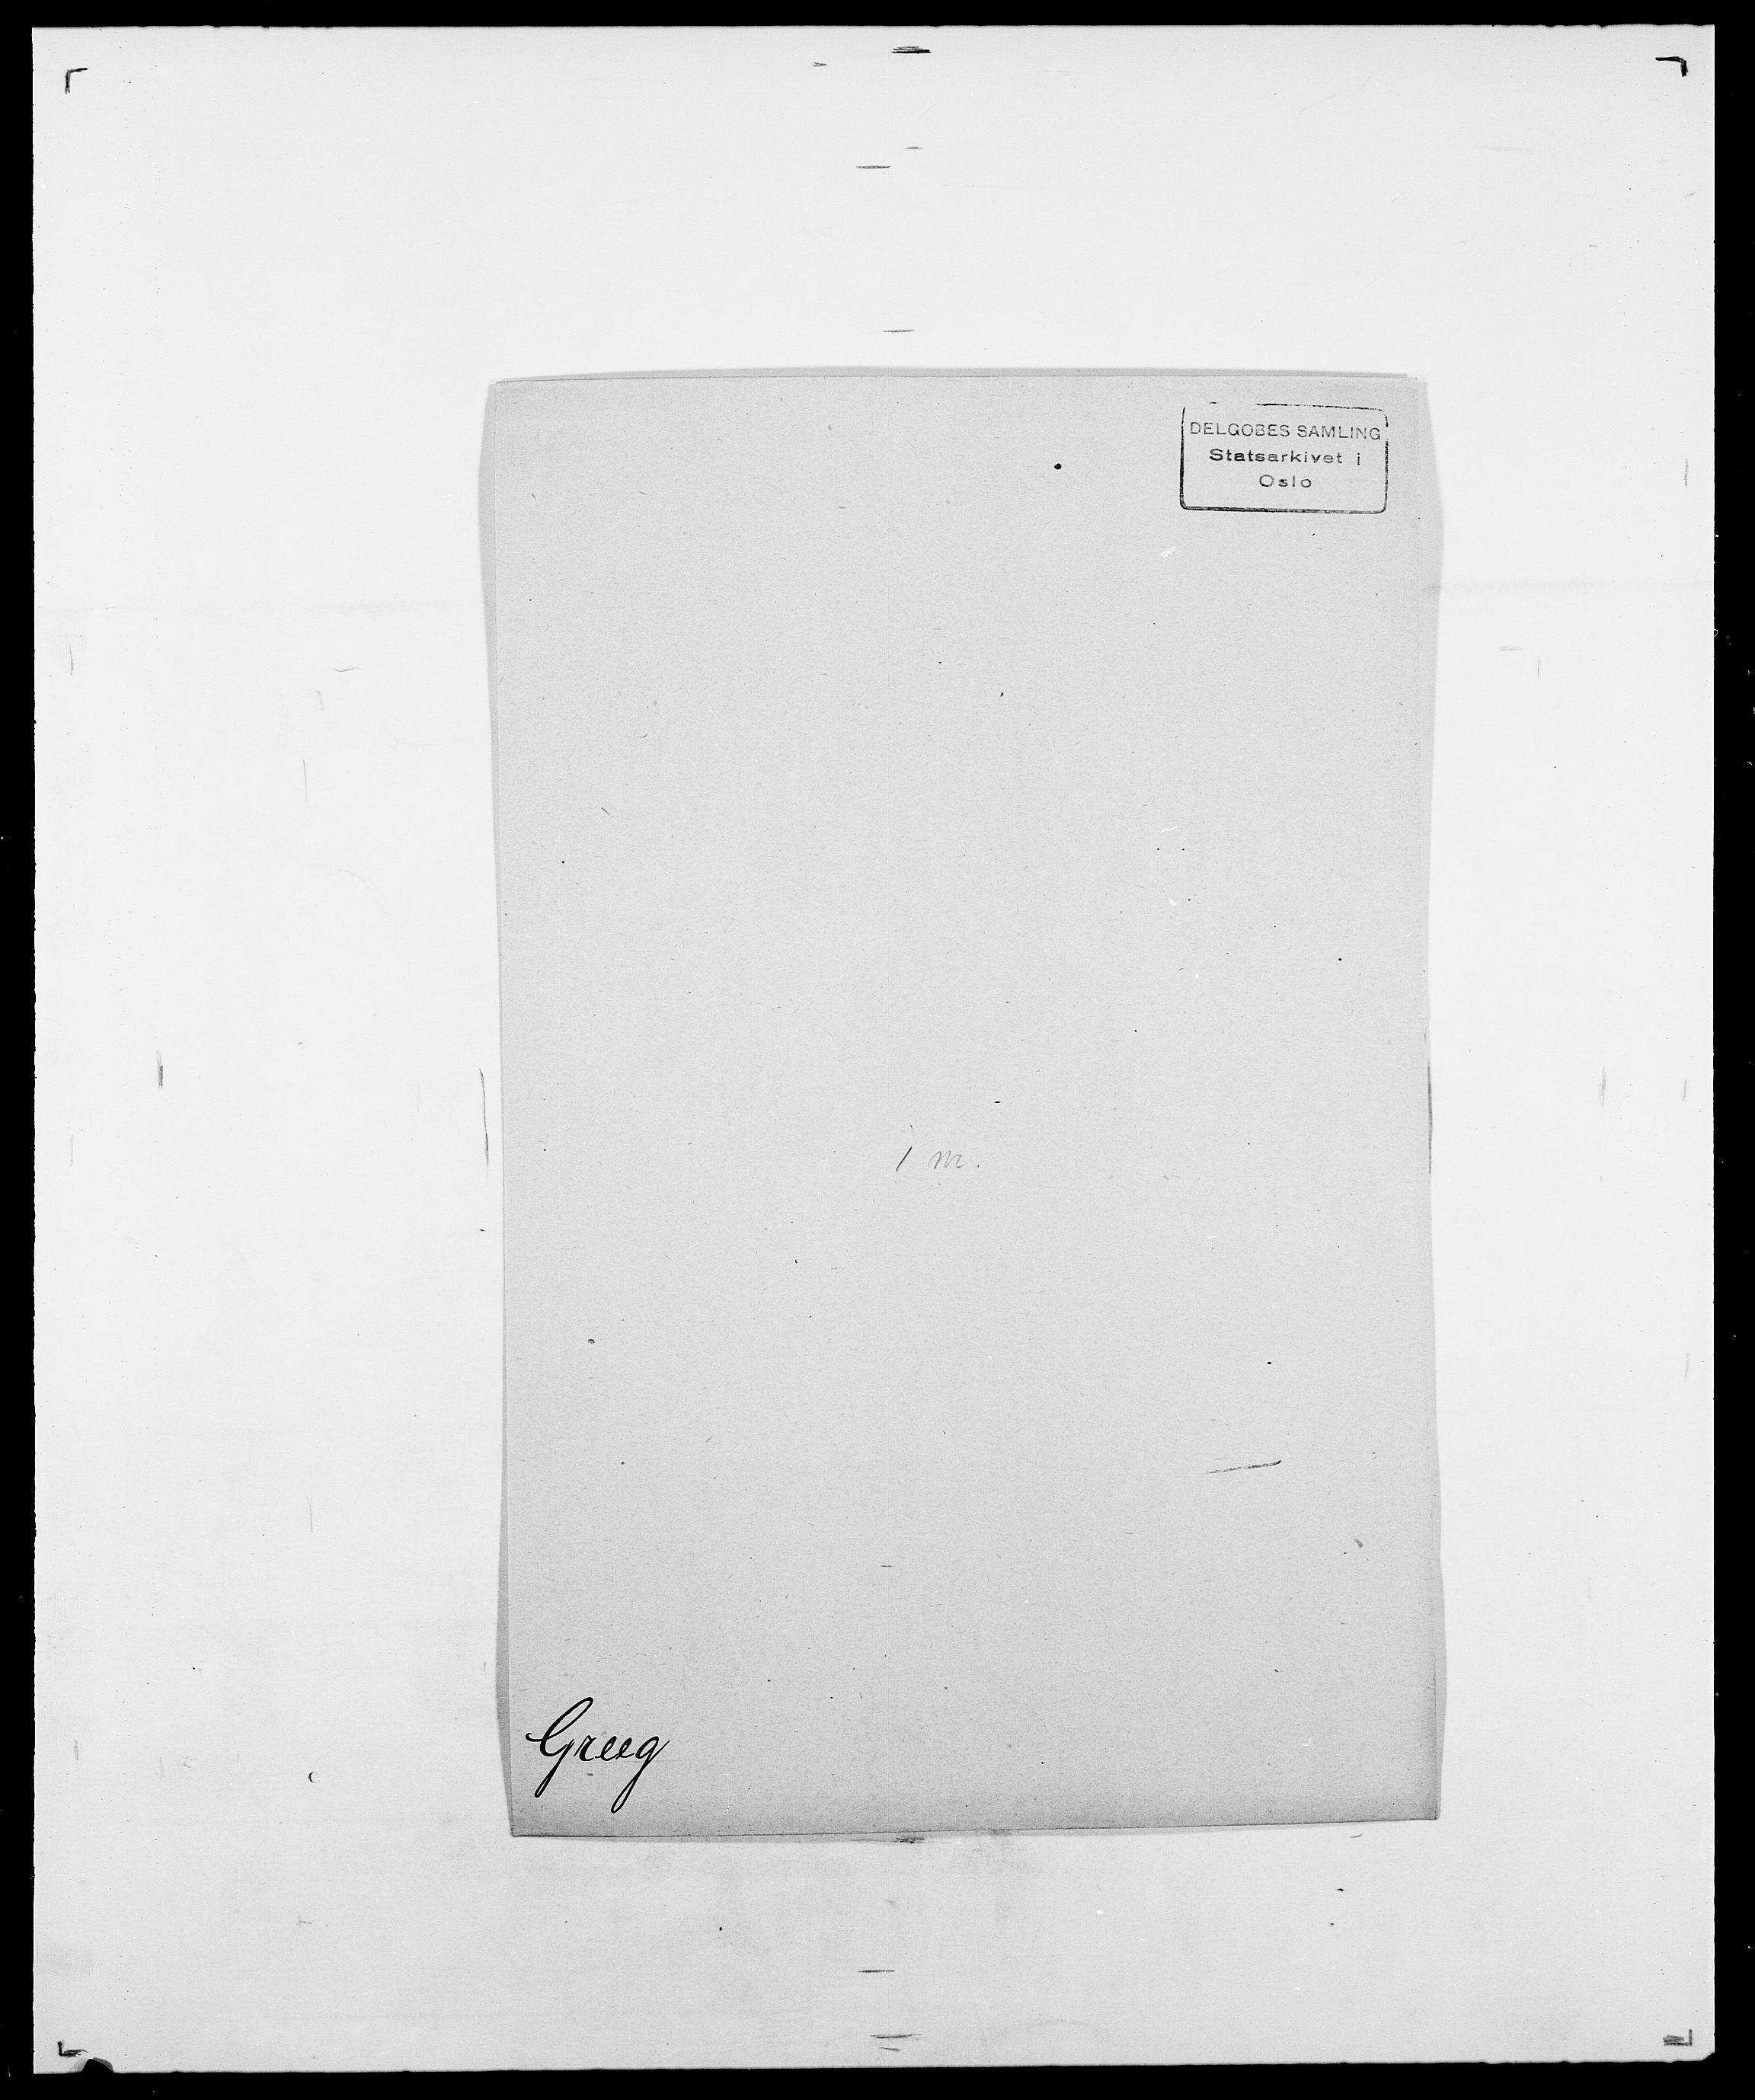 SAO, Delgobe, Charles Antoine - samling, D/Da/L0014: Giebdhausen - Grip, s. 567